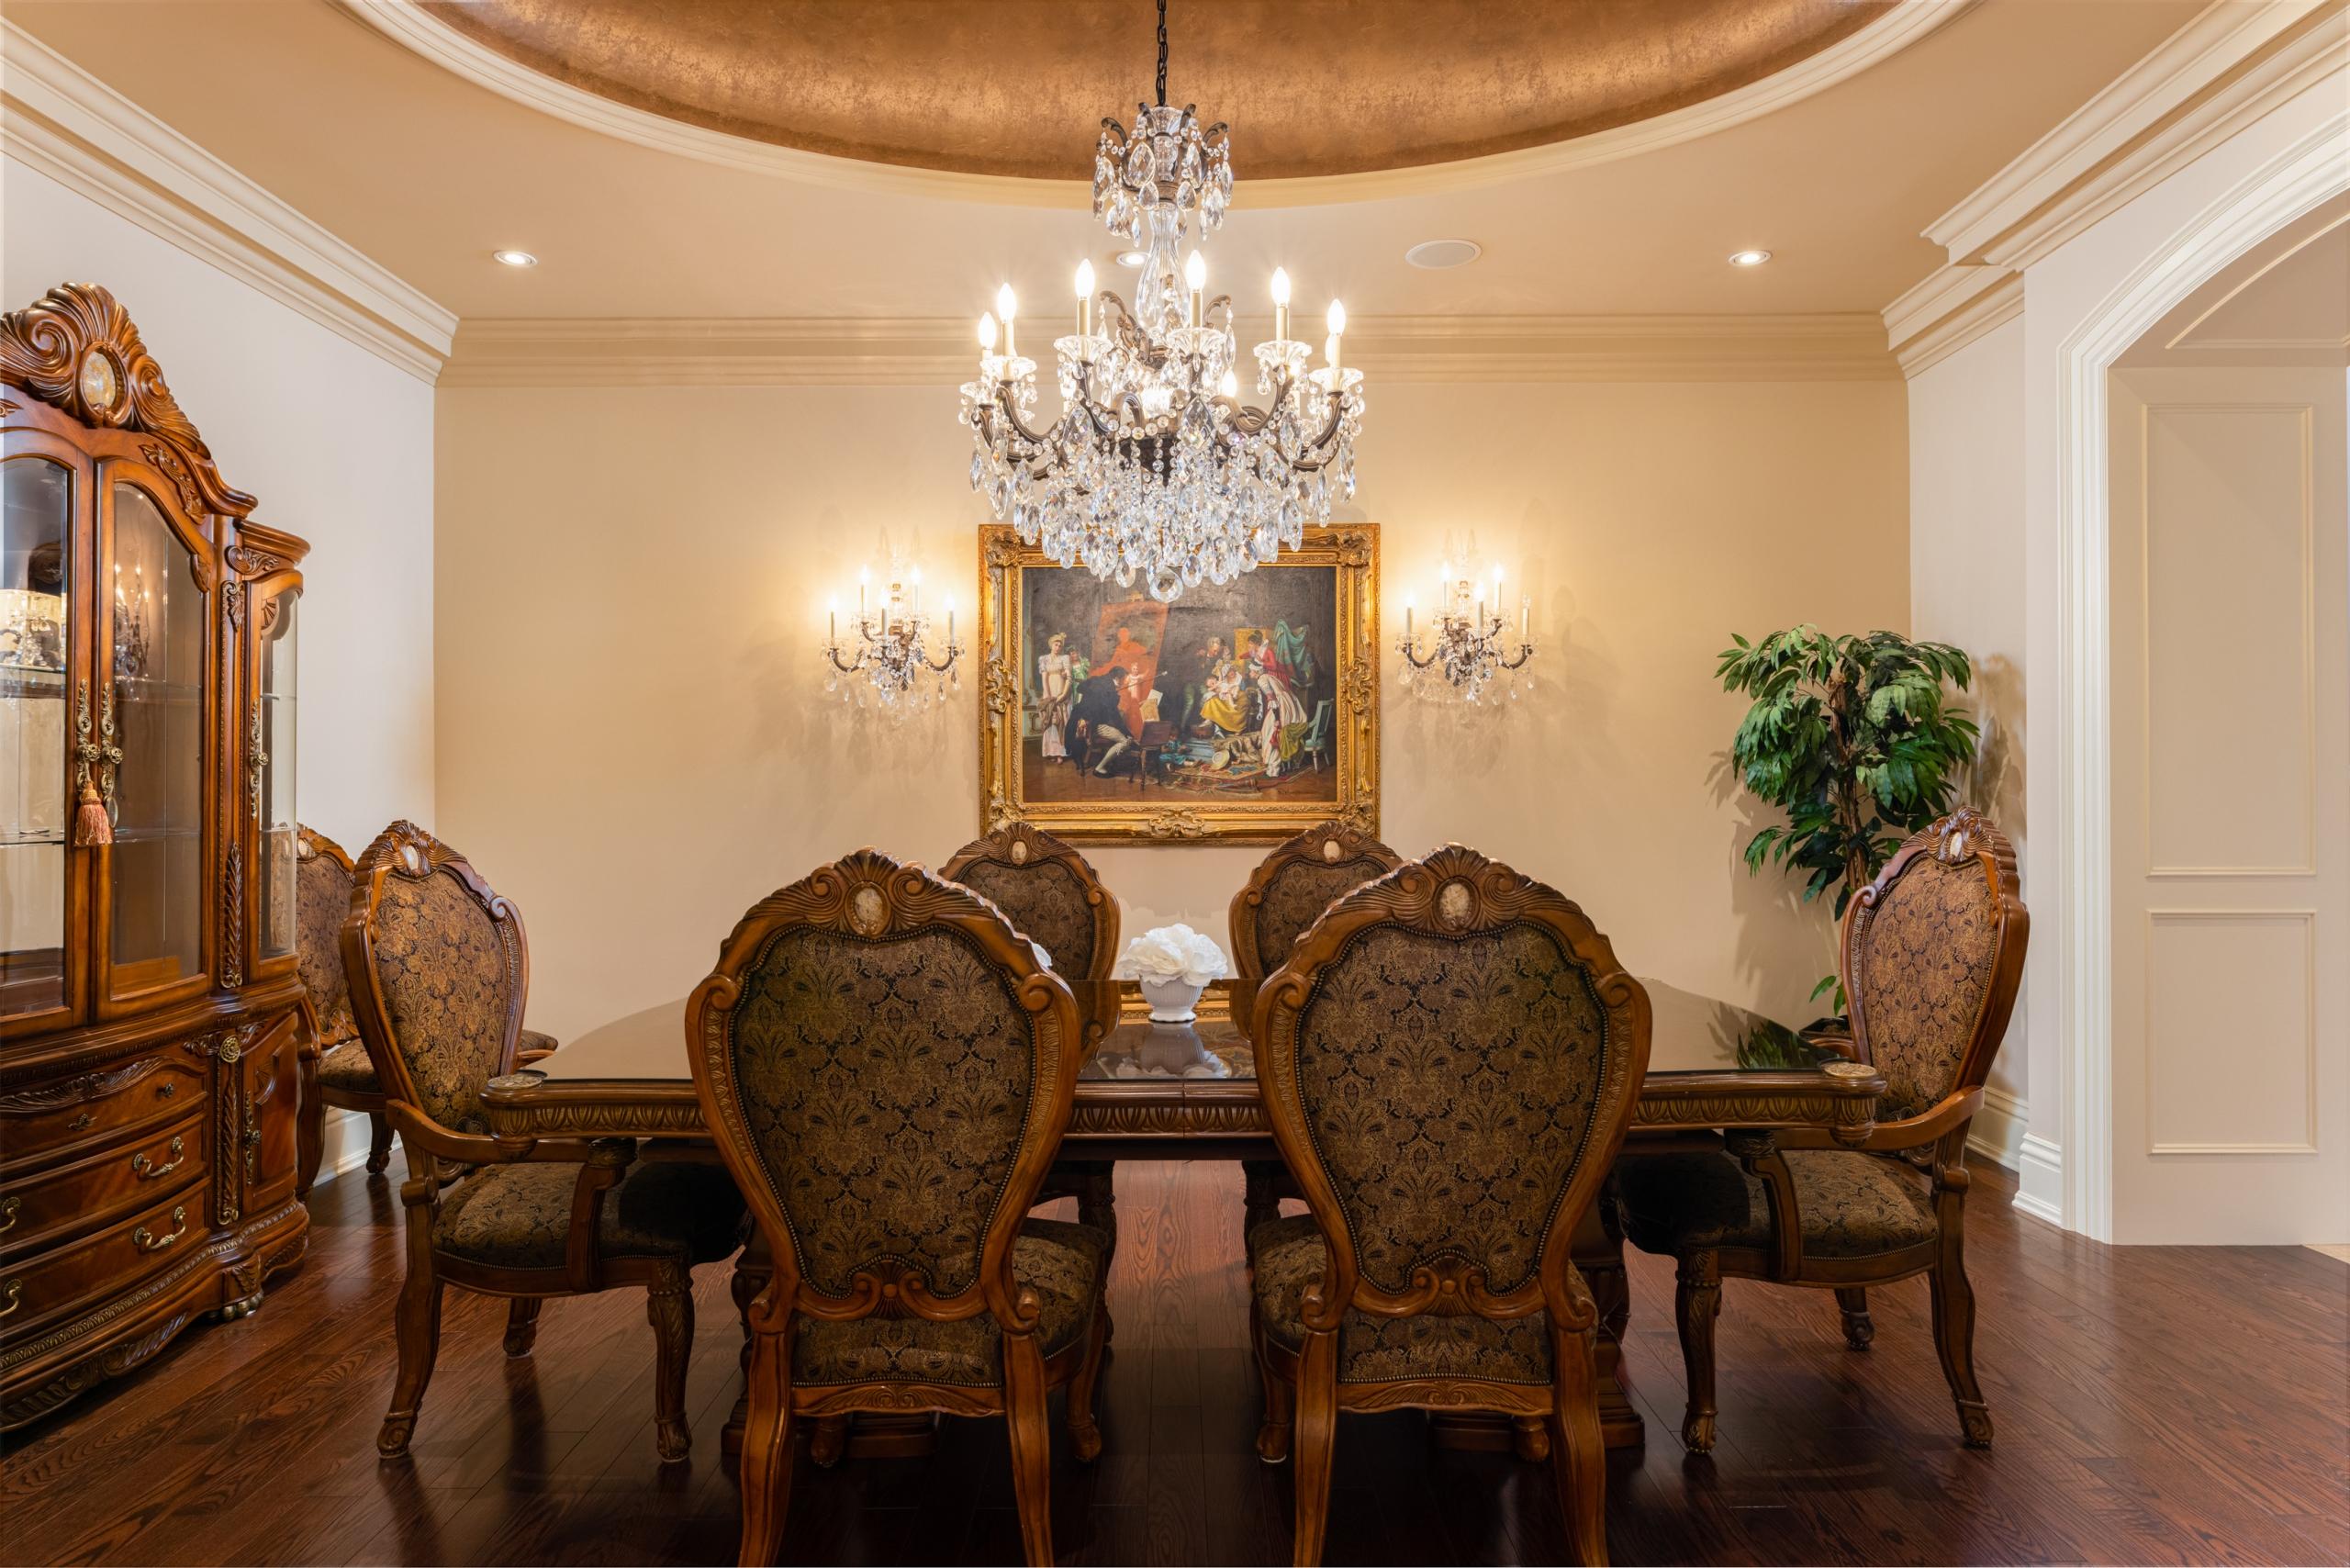 Dining room featured at 2594 Bluffs Way, Burlington at Alex Irish & Associates